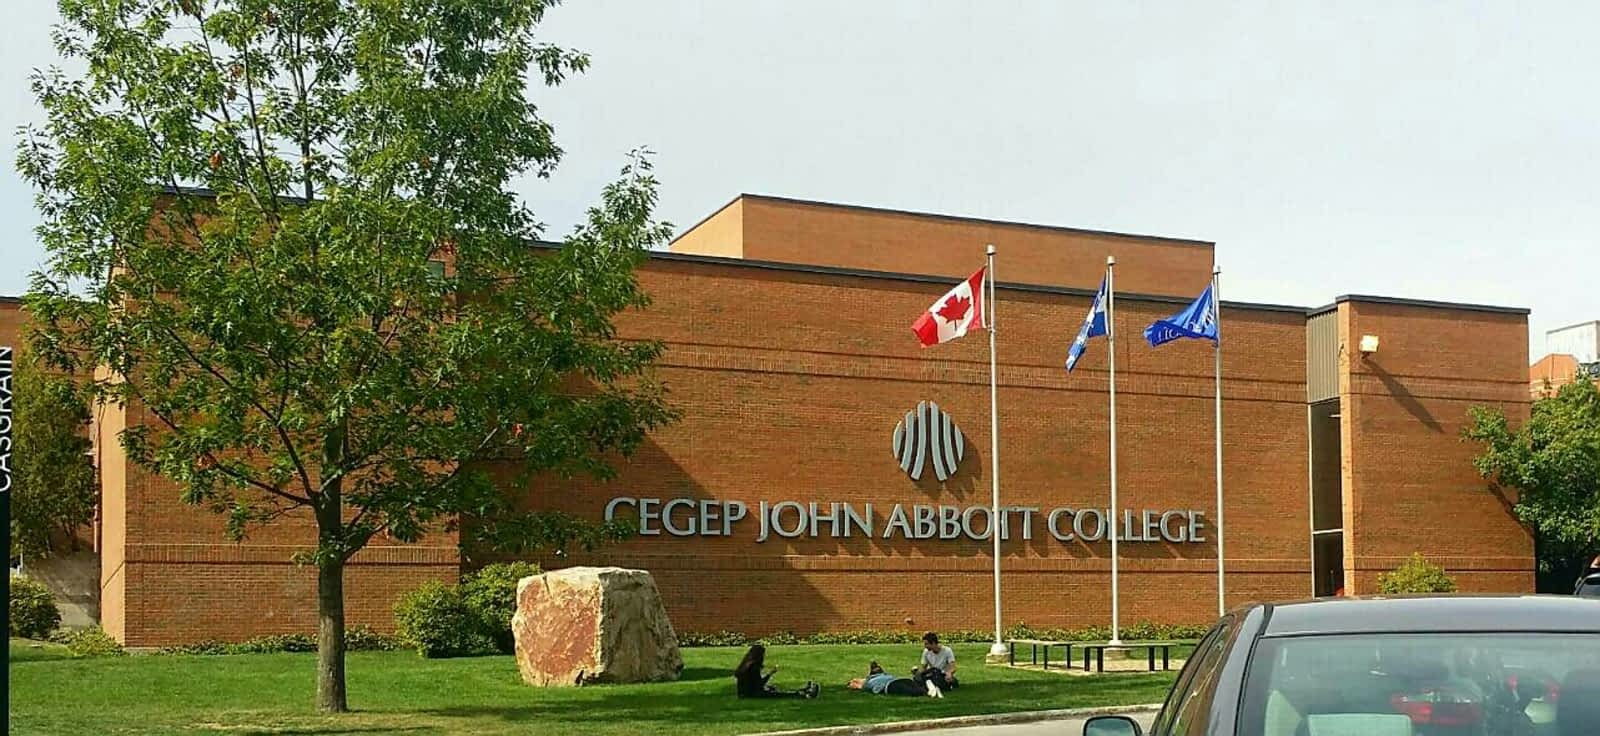 John Abbott College CEGEP